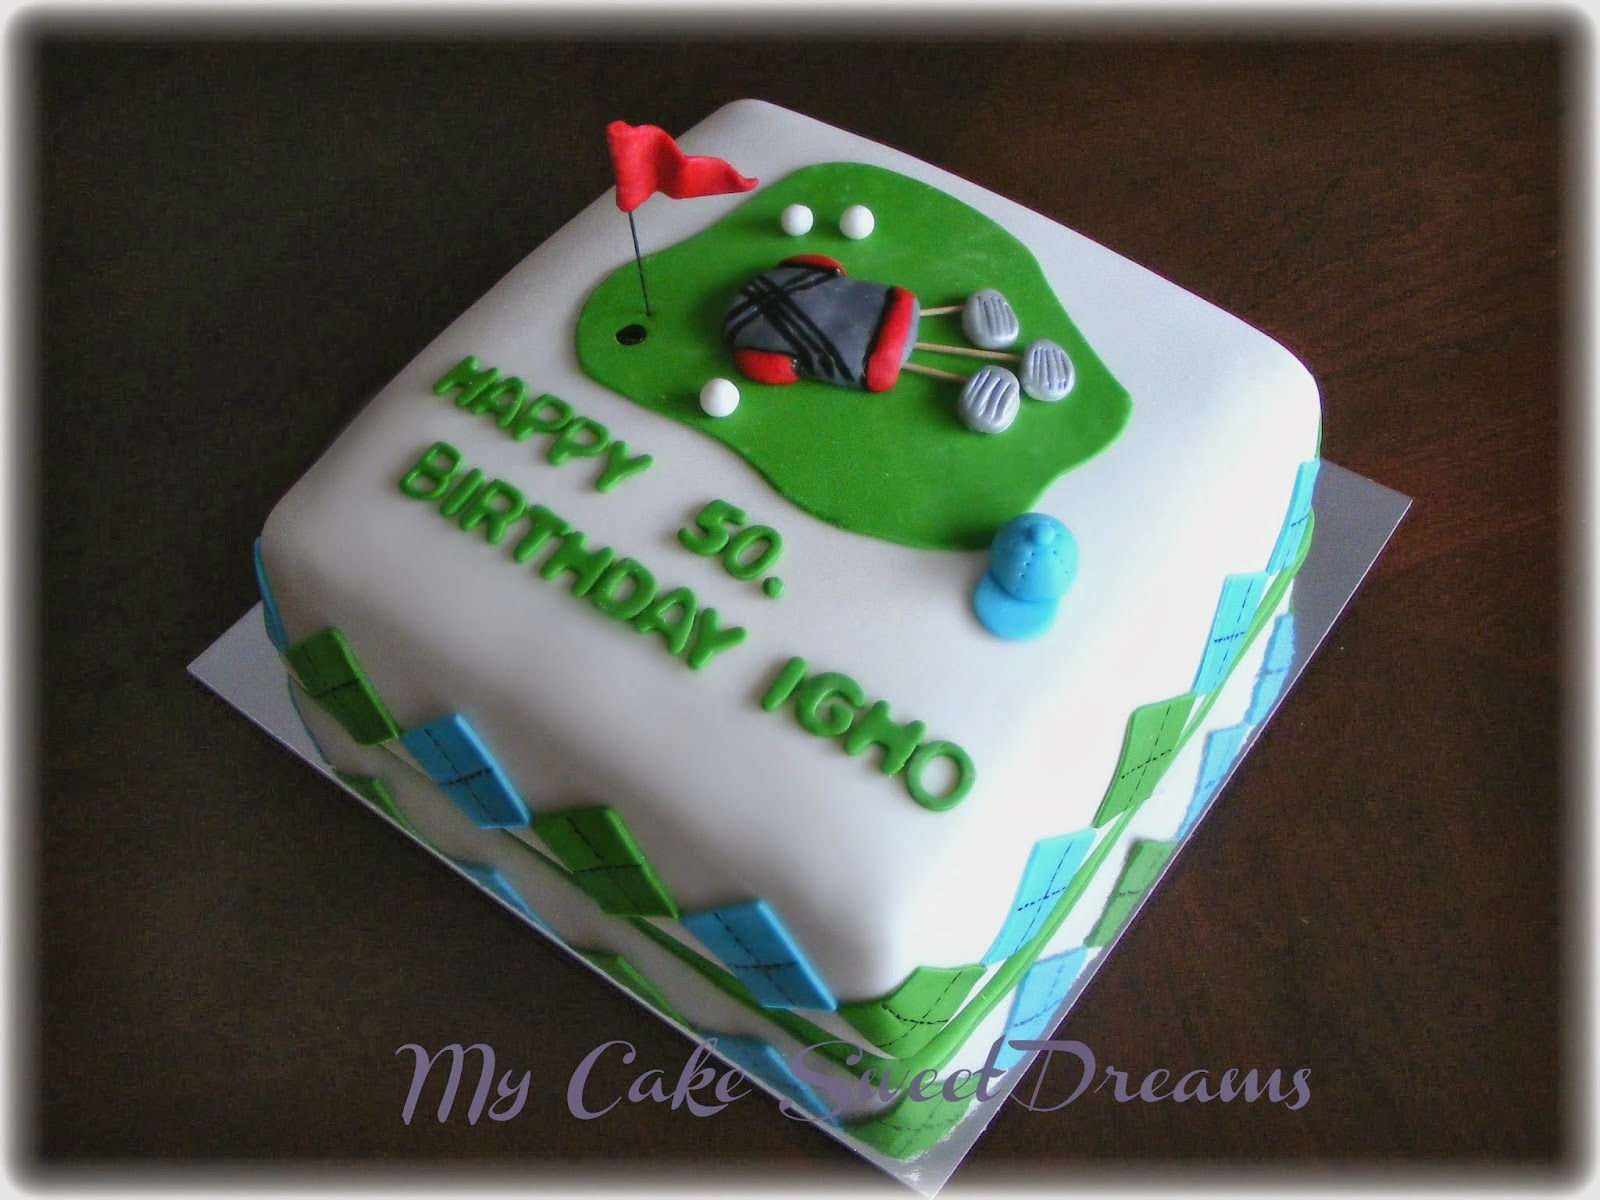 Mycakesweetdreams Golf Themed Cake